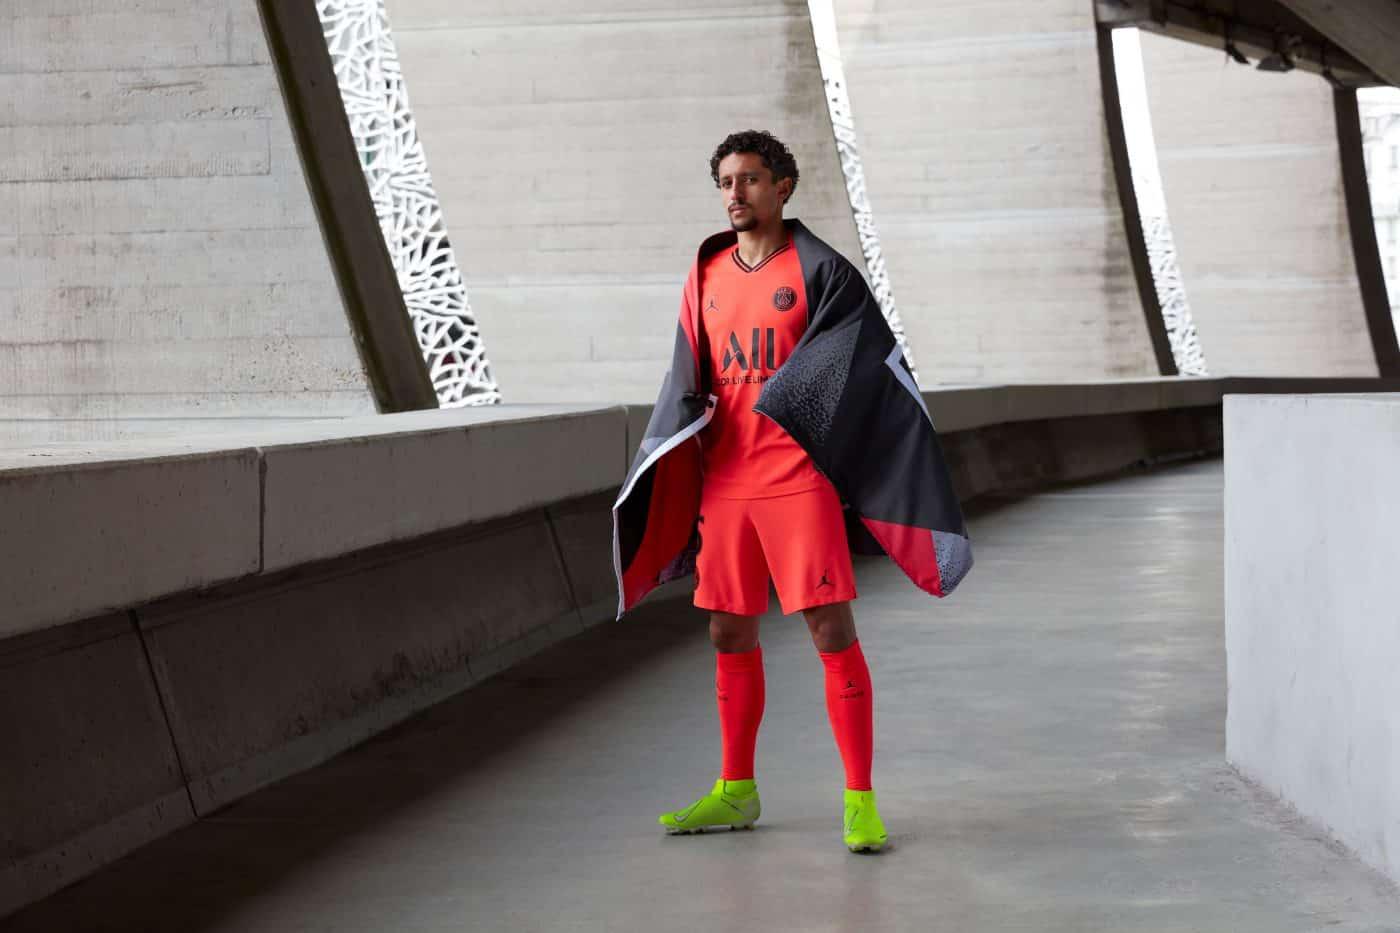 maillot-exterieur-paris-saint-germain-psg-2019-2020-jordan-8